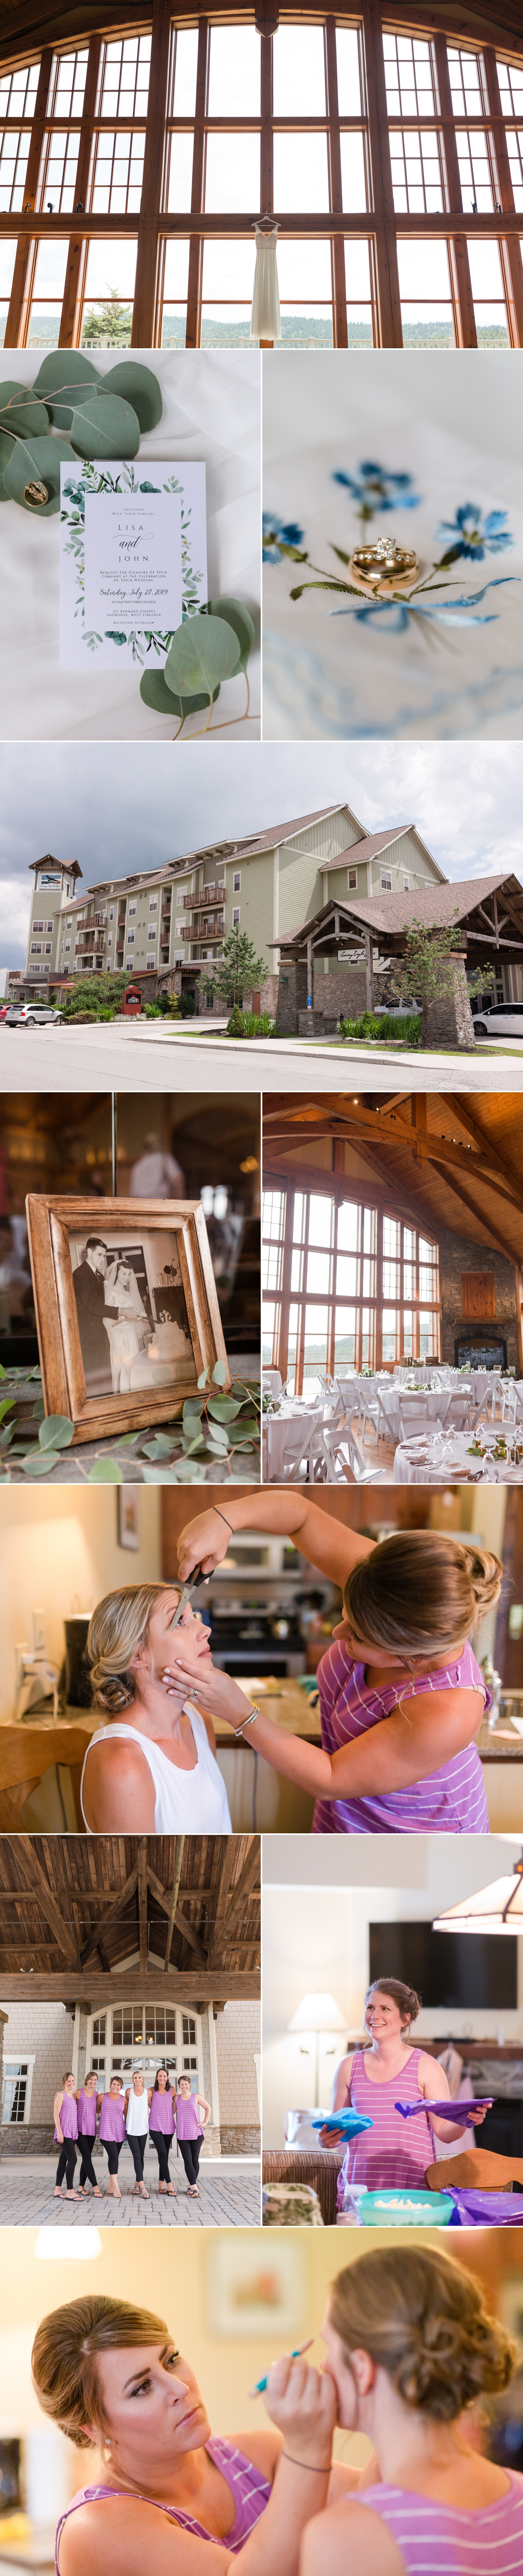 snowshoe resort wedding, preparations collage